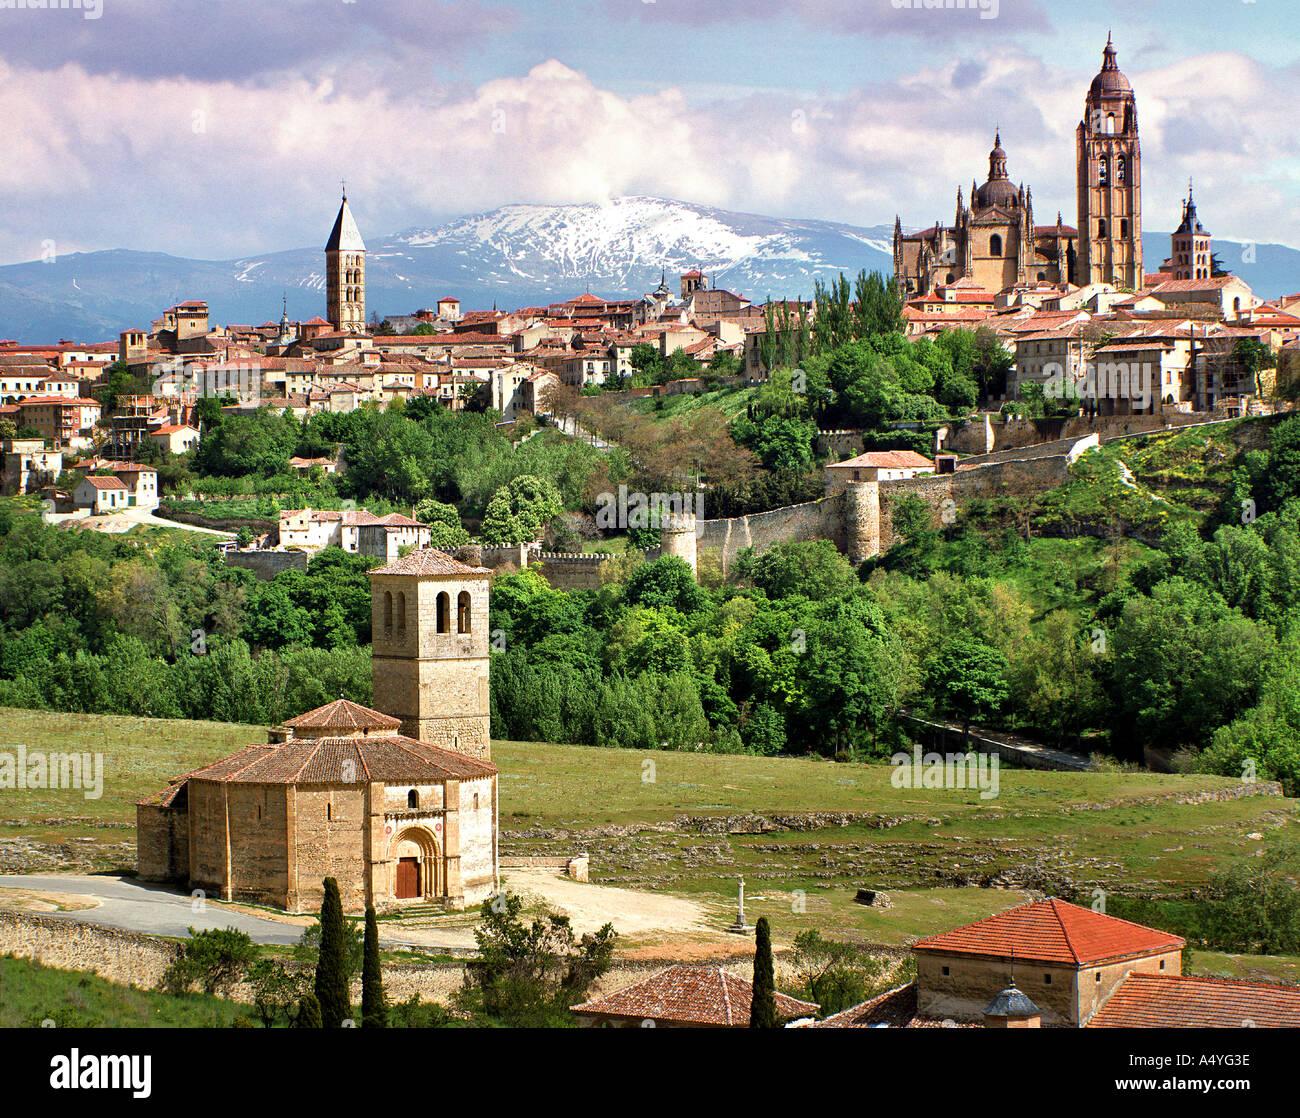 ES - Kastilien: Historische Alcazar Burg über Segovia Stockbild